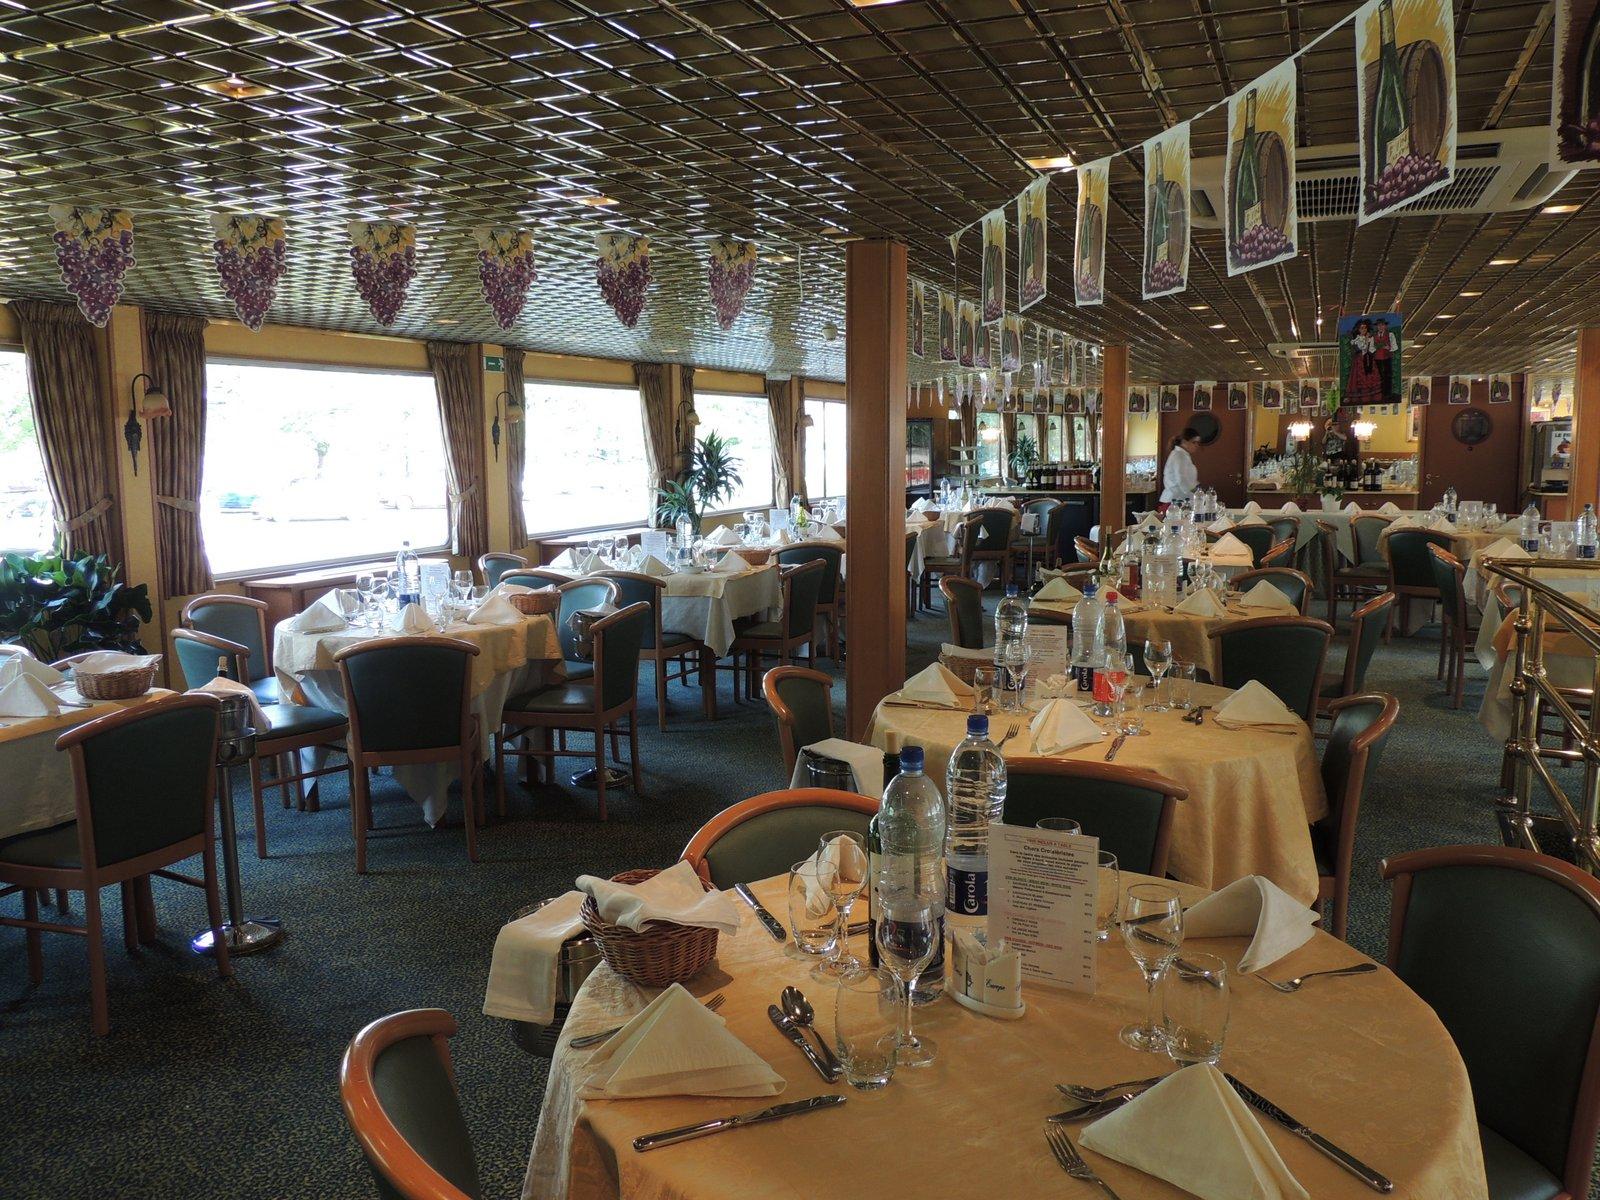 MS Leonardo da Vinci auf dem Rhein - Restaurant